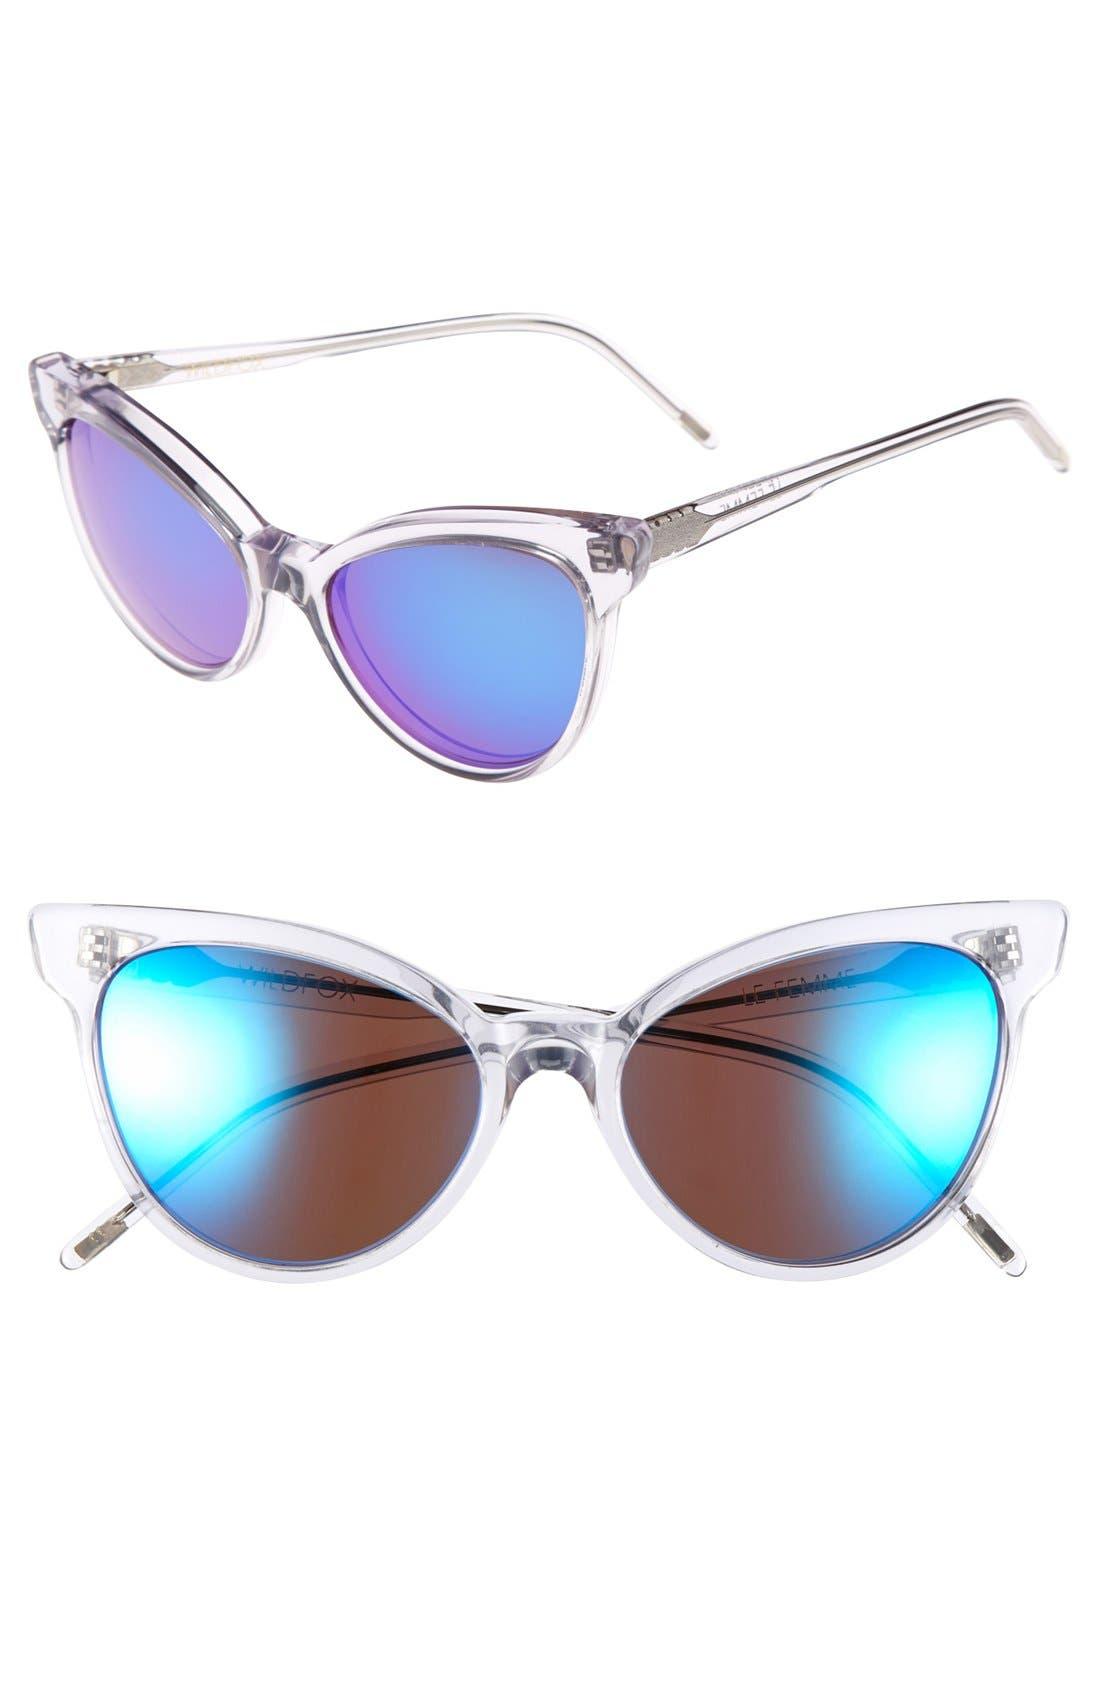 Alternate Image 1 Selected - Wildfox 'La Femme Deluxe' 55mm Sunglasses